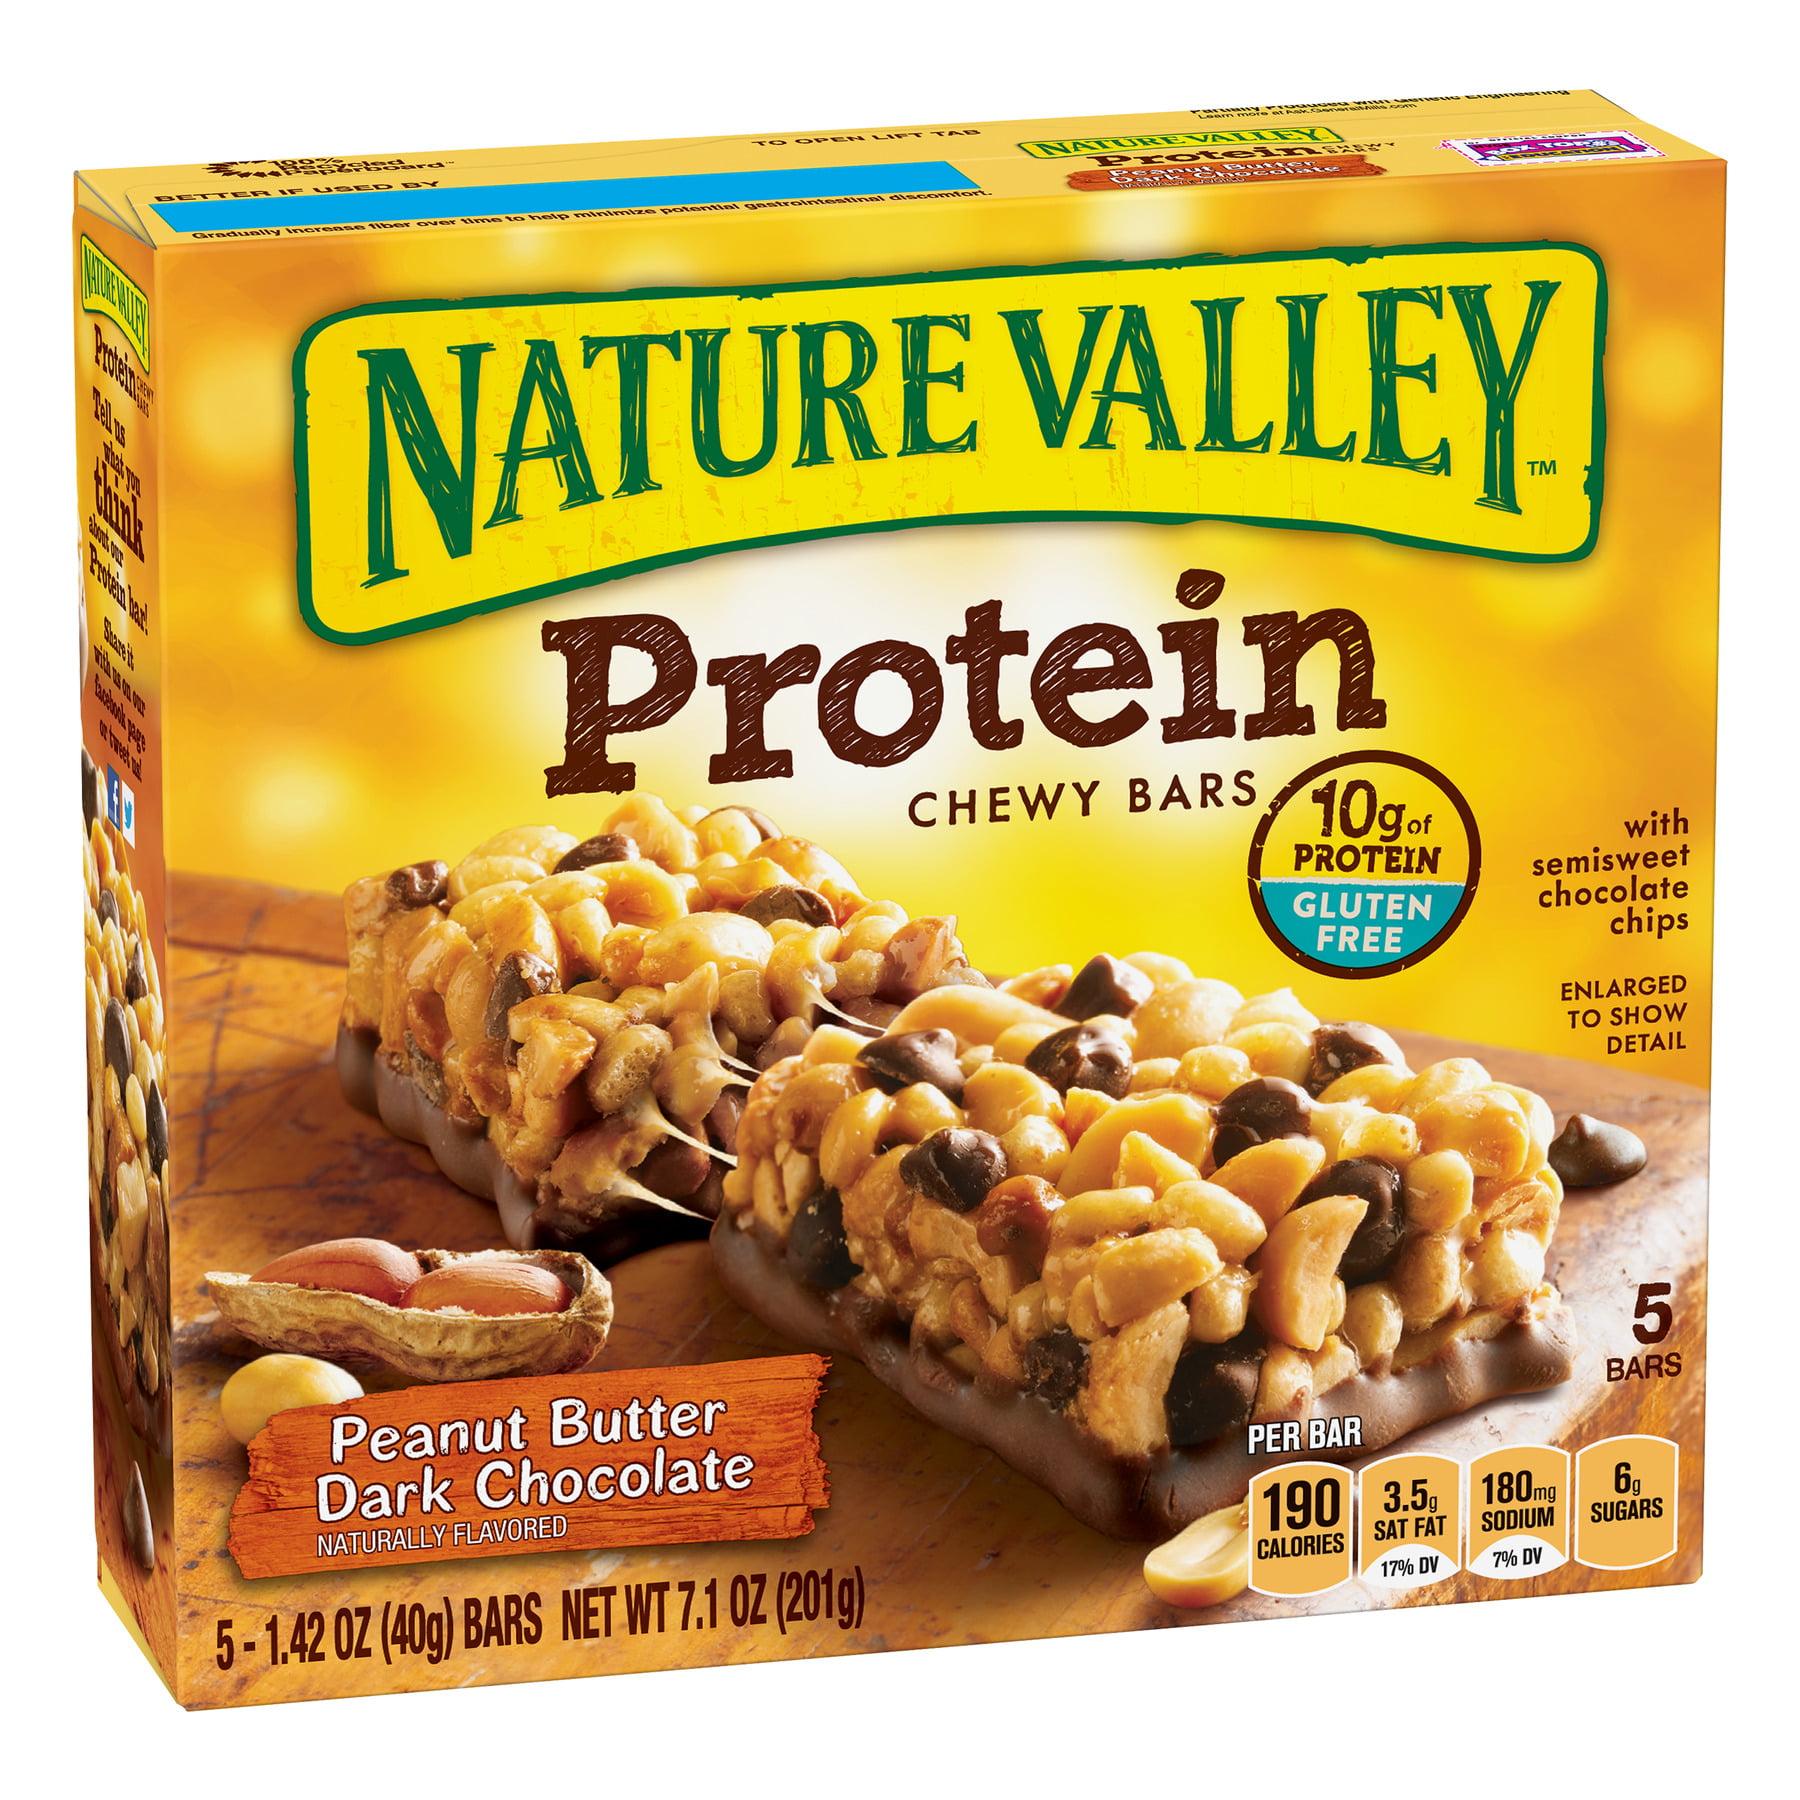 Nature Valley Protein Chewy Bar, Peanut Butter Dark Chocolate, 10g Protein, 5 Ct